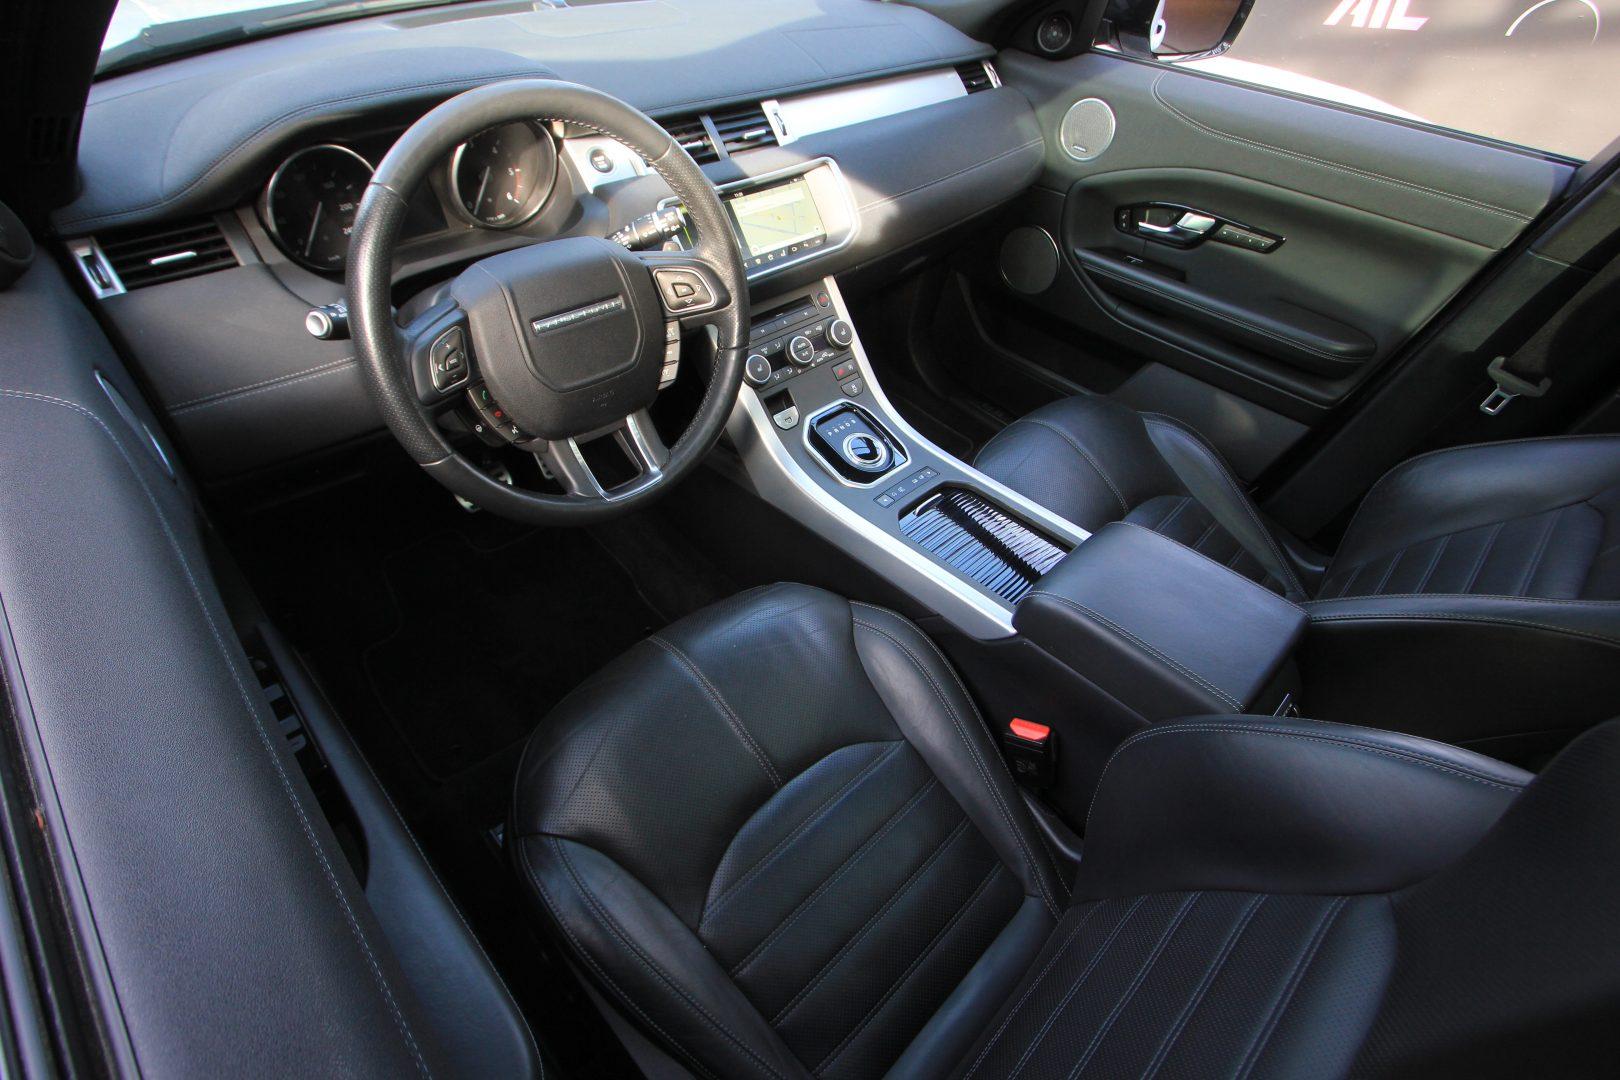 AIL Land Rover Range Rover Evoque HSE Dynamic Design-Paket  7